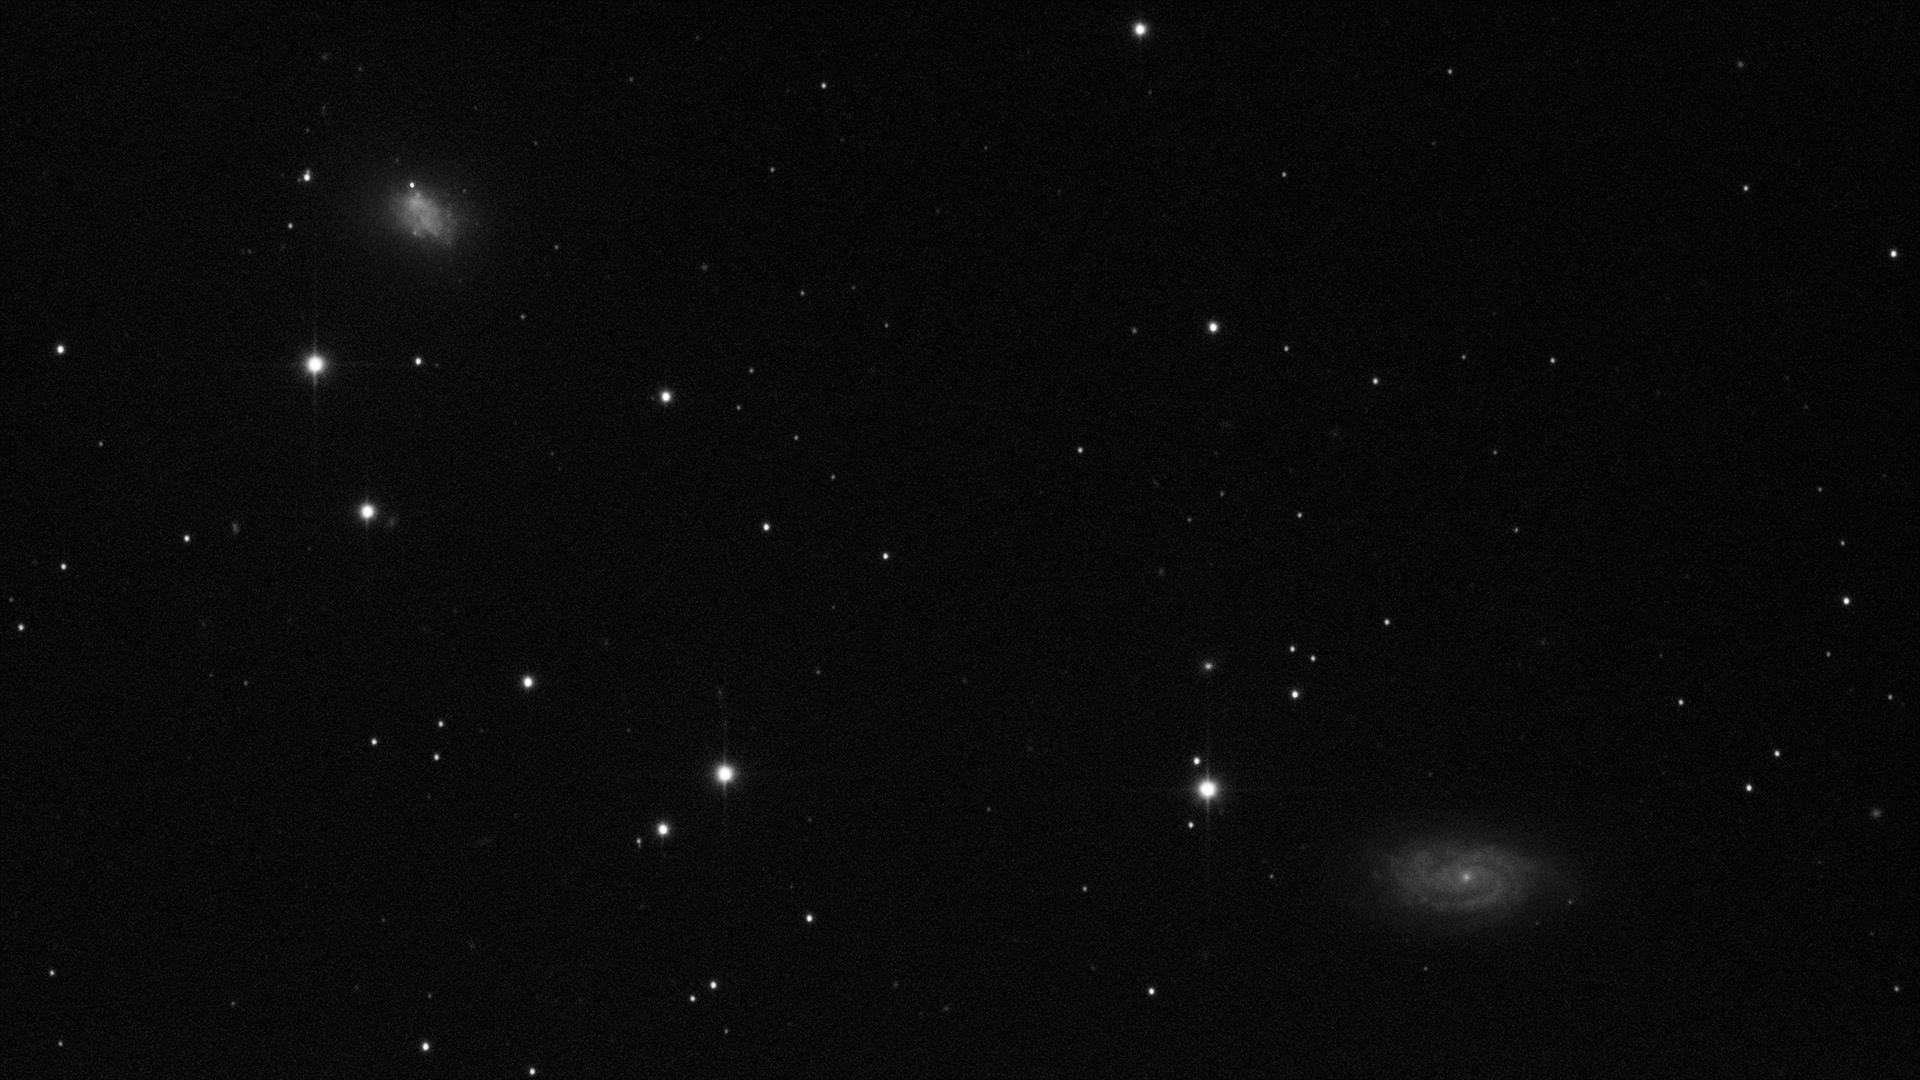 r_pp_NGC3756_stacked.jpg.7f4bbd3a7762d16279fd15bf467333f9.jpg